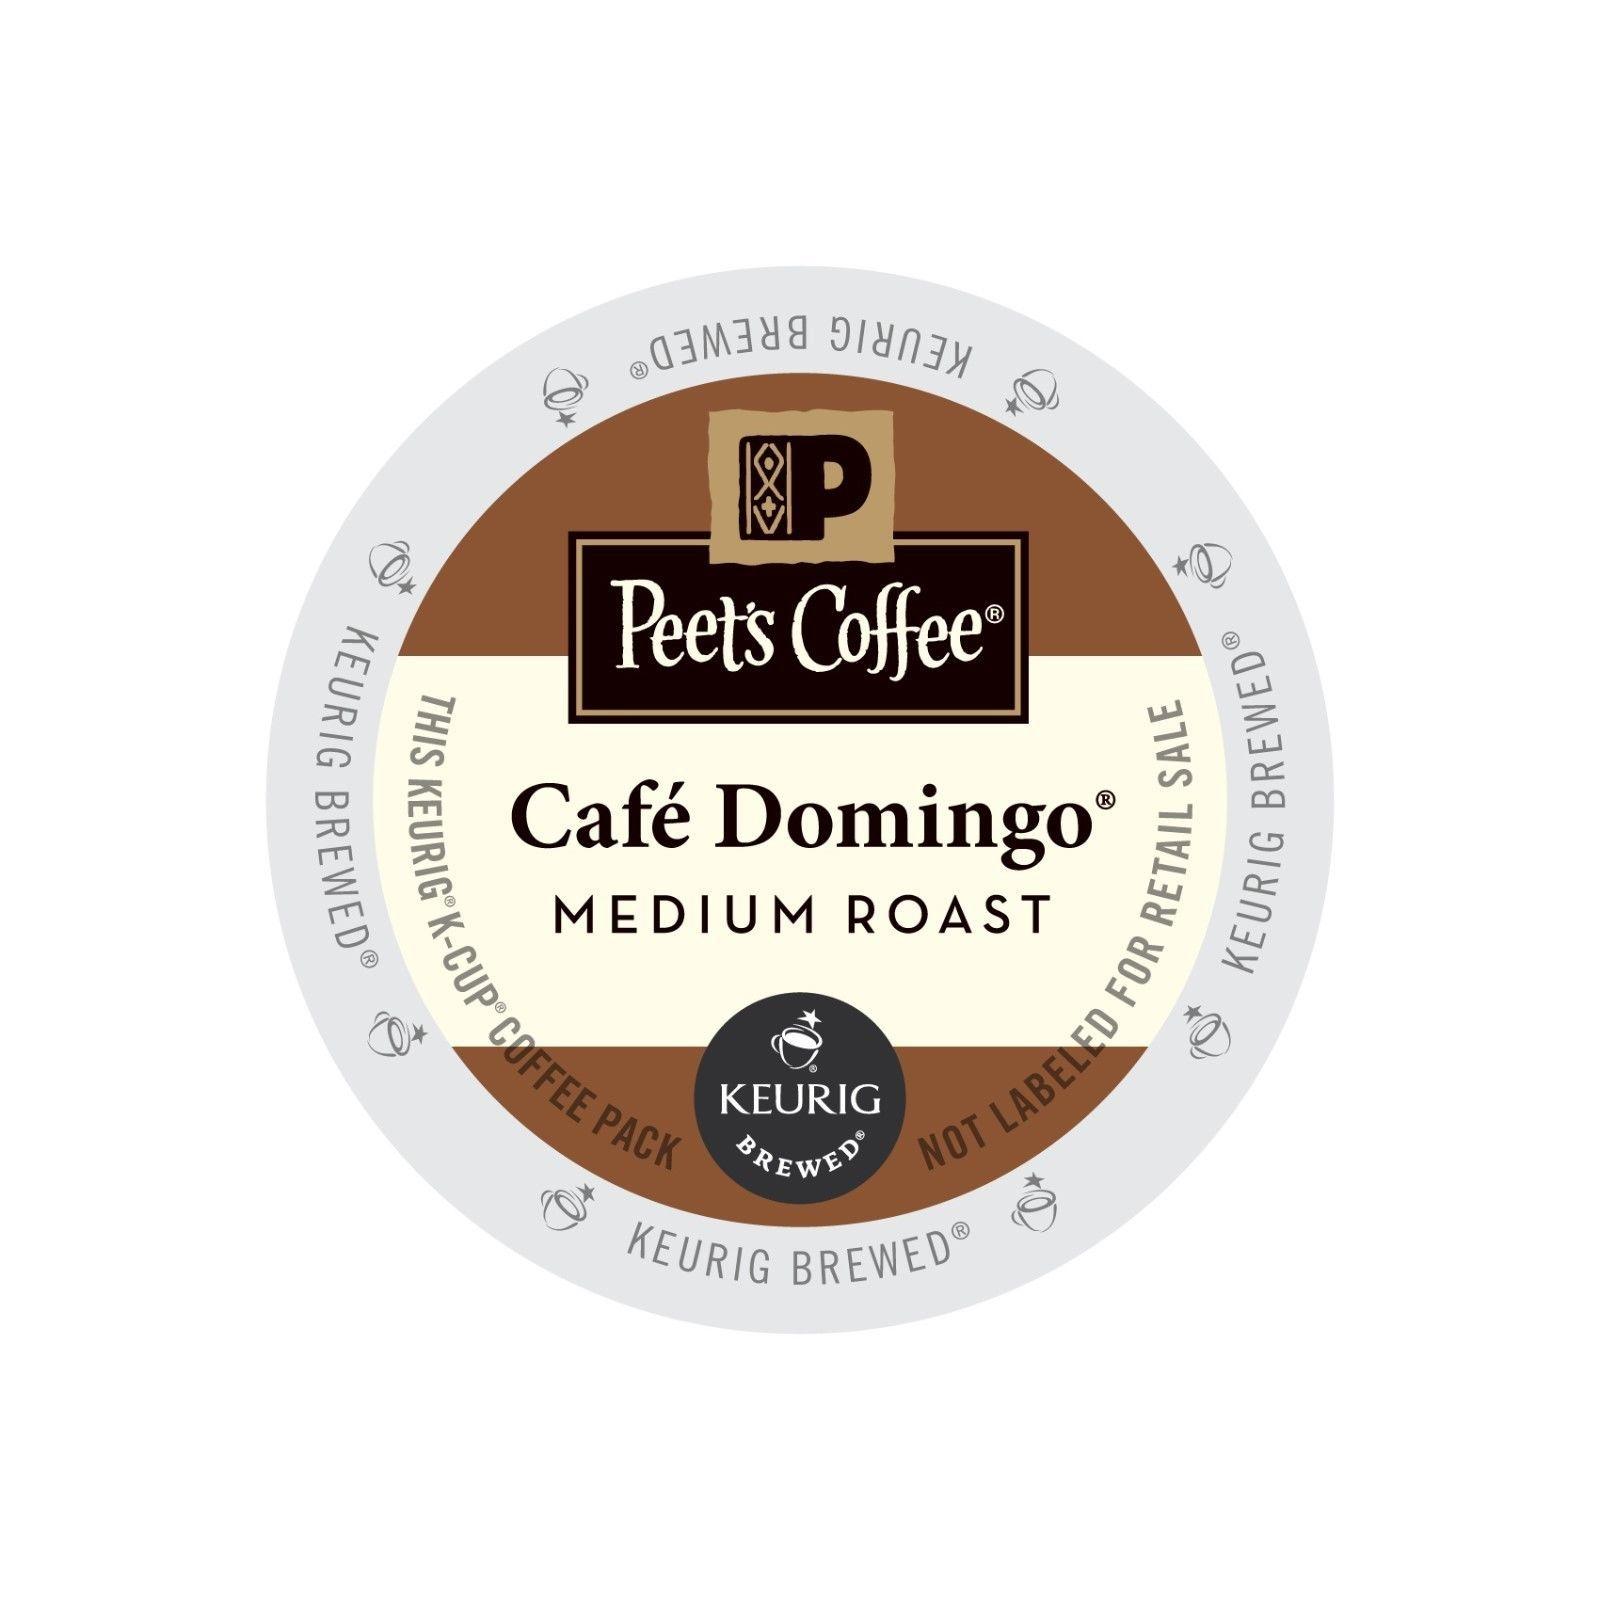 Peet's Coffee Cafe Domingo Coffee, 88 Kcups, FREE SHIPPING